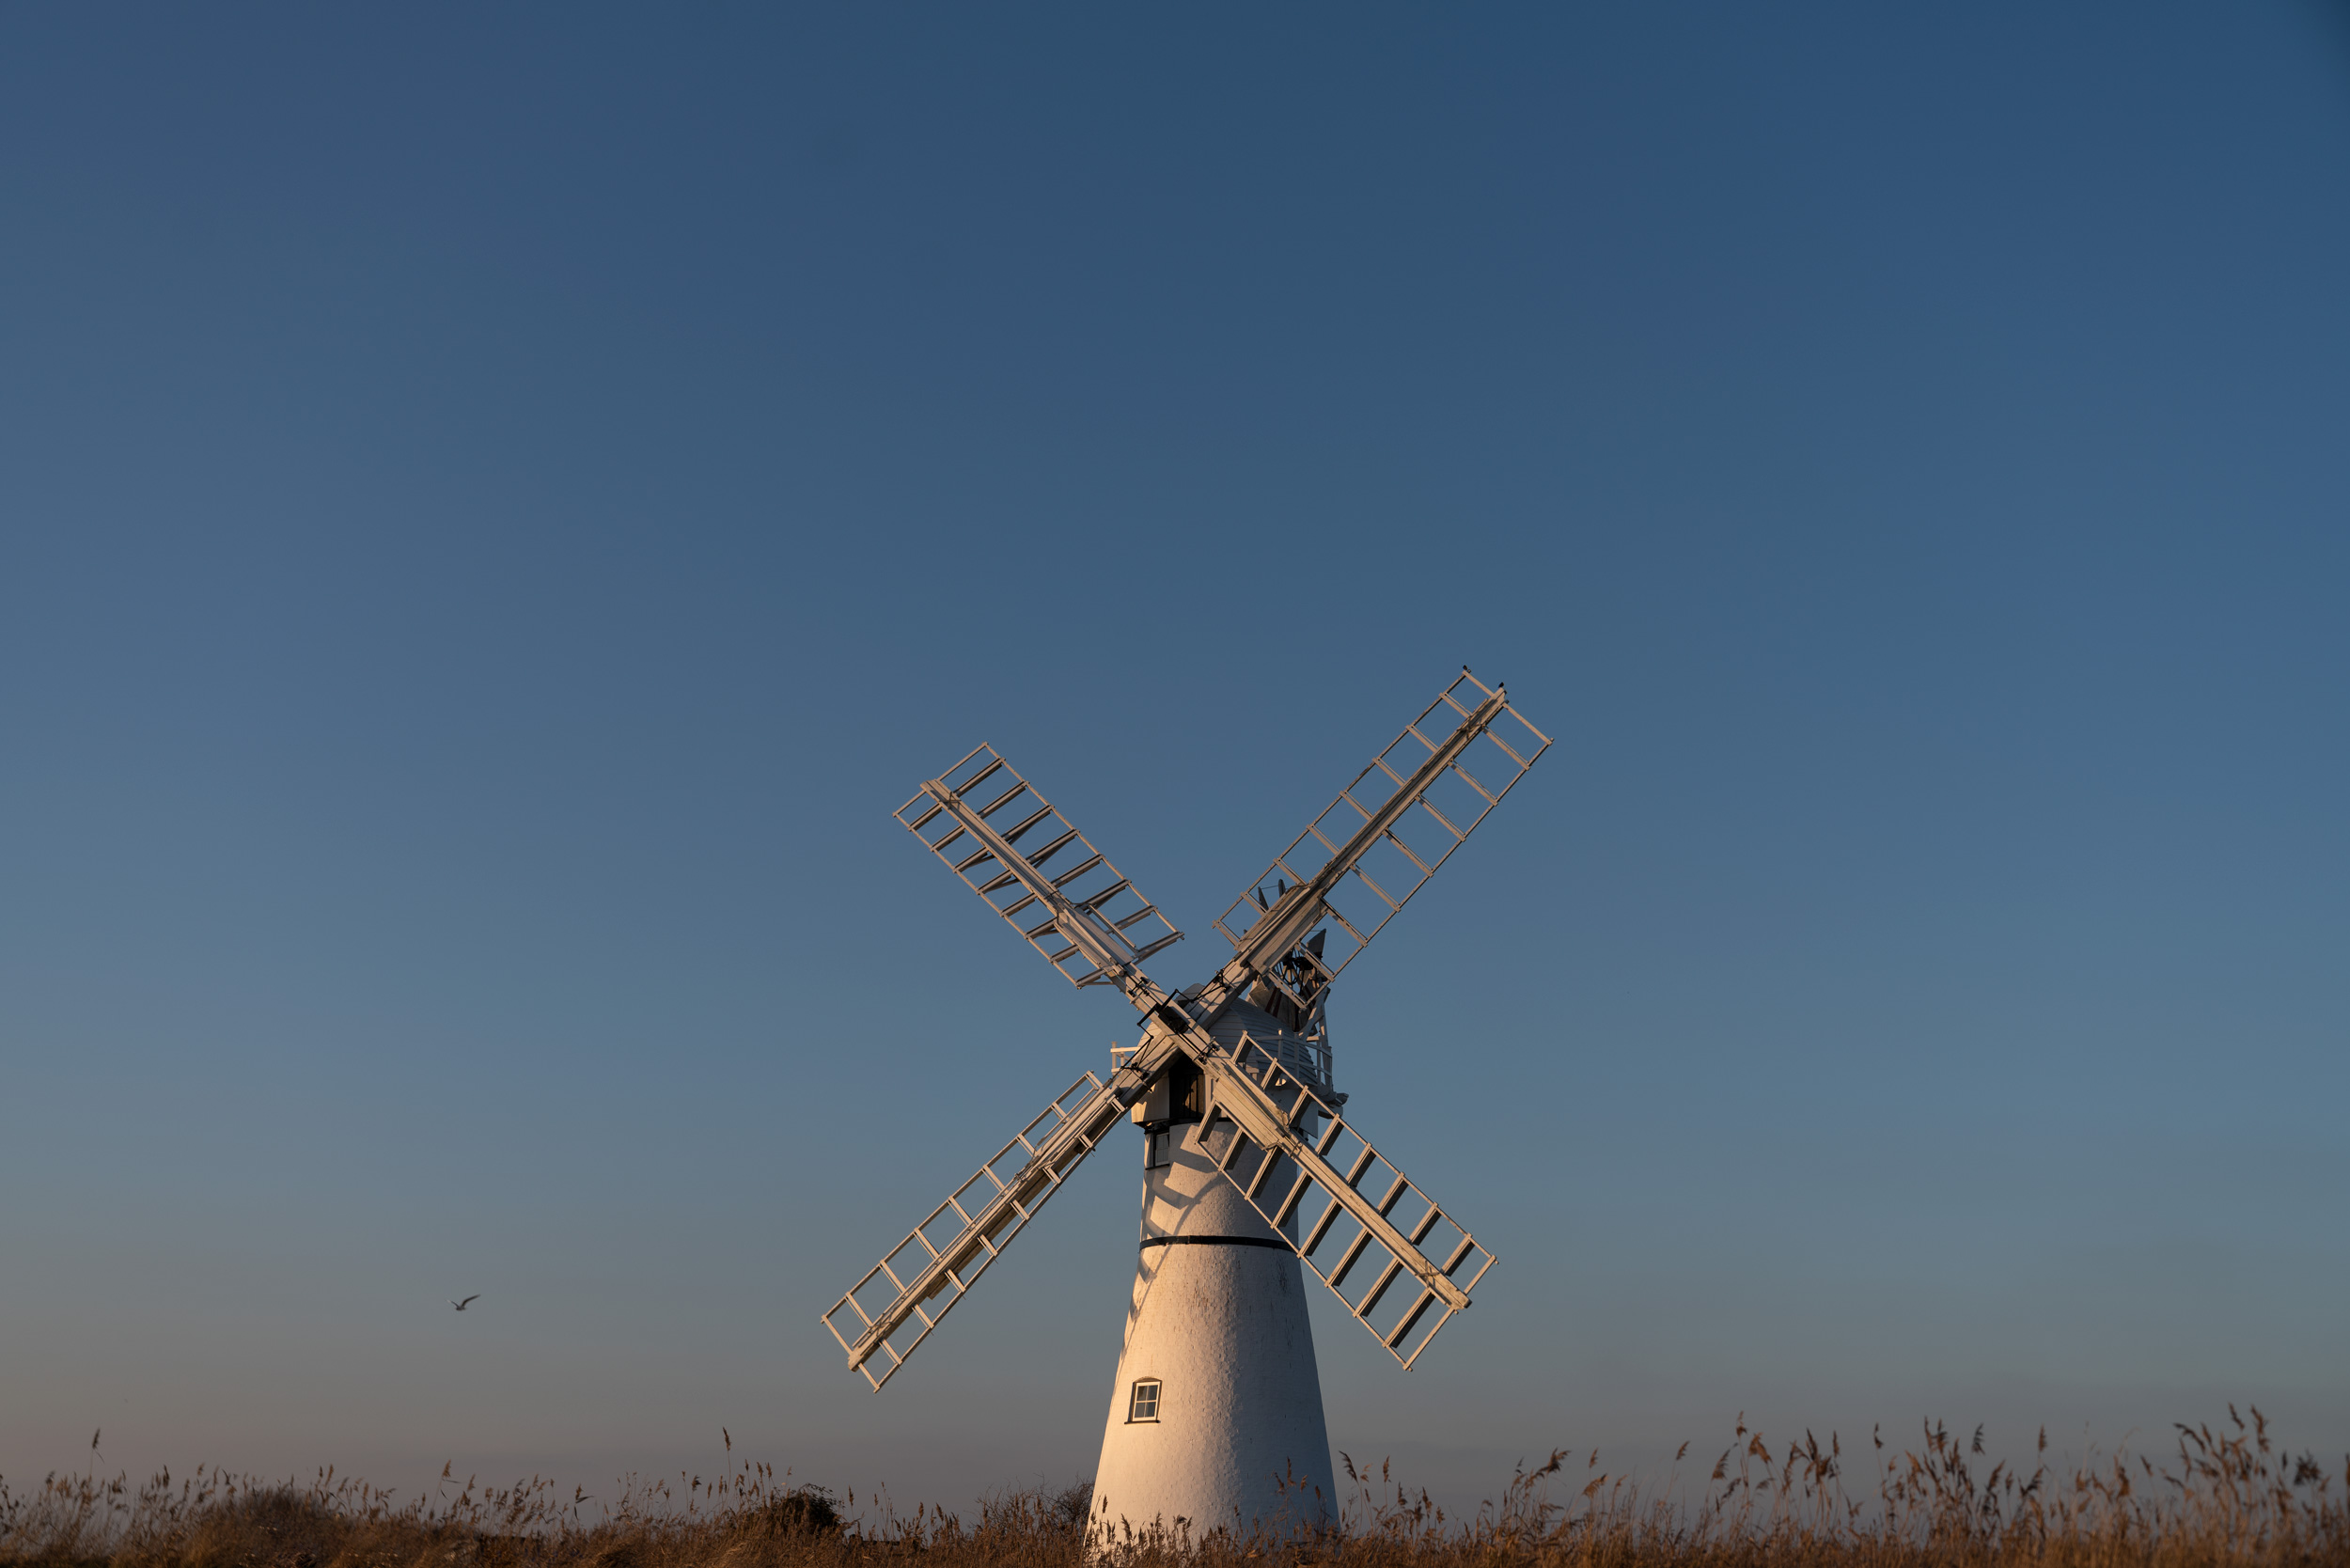 Fiona-Burrage-Thurne-Windmill-Norfolk-Broads-Norfolk.jpg